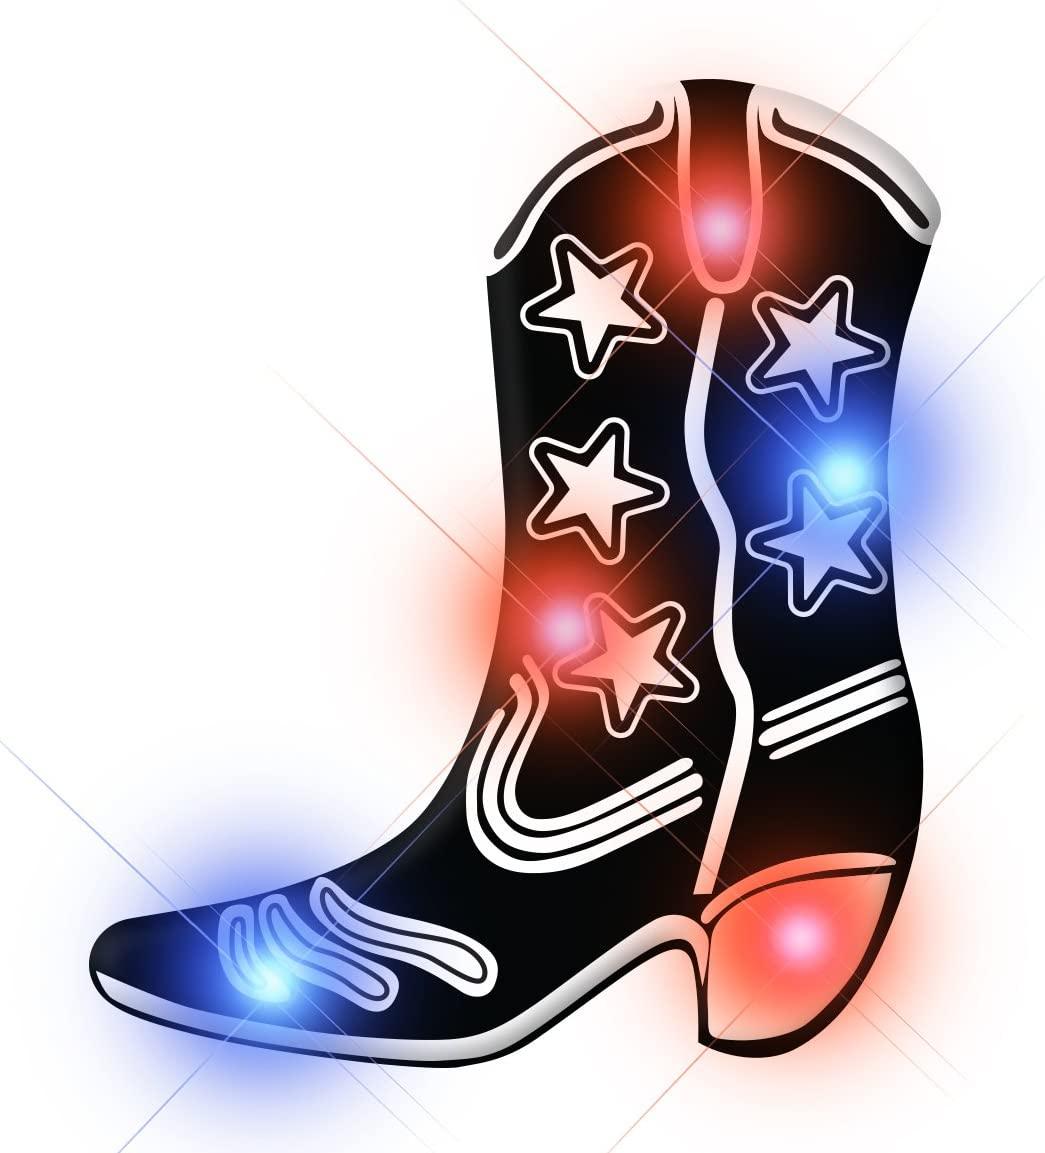 Light Up Black Cowboy Boot Flashing Blinking LED Body Light Lapel Pins (Set of 25)